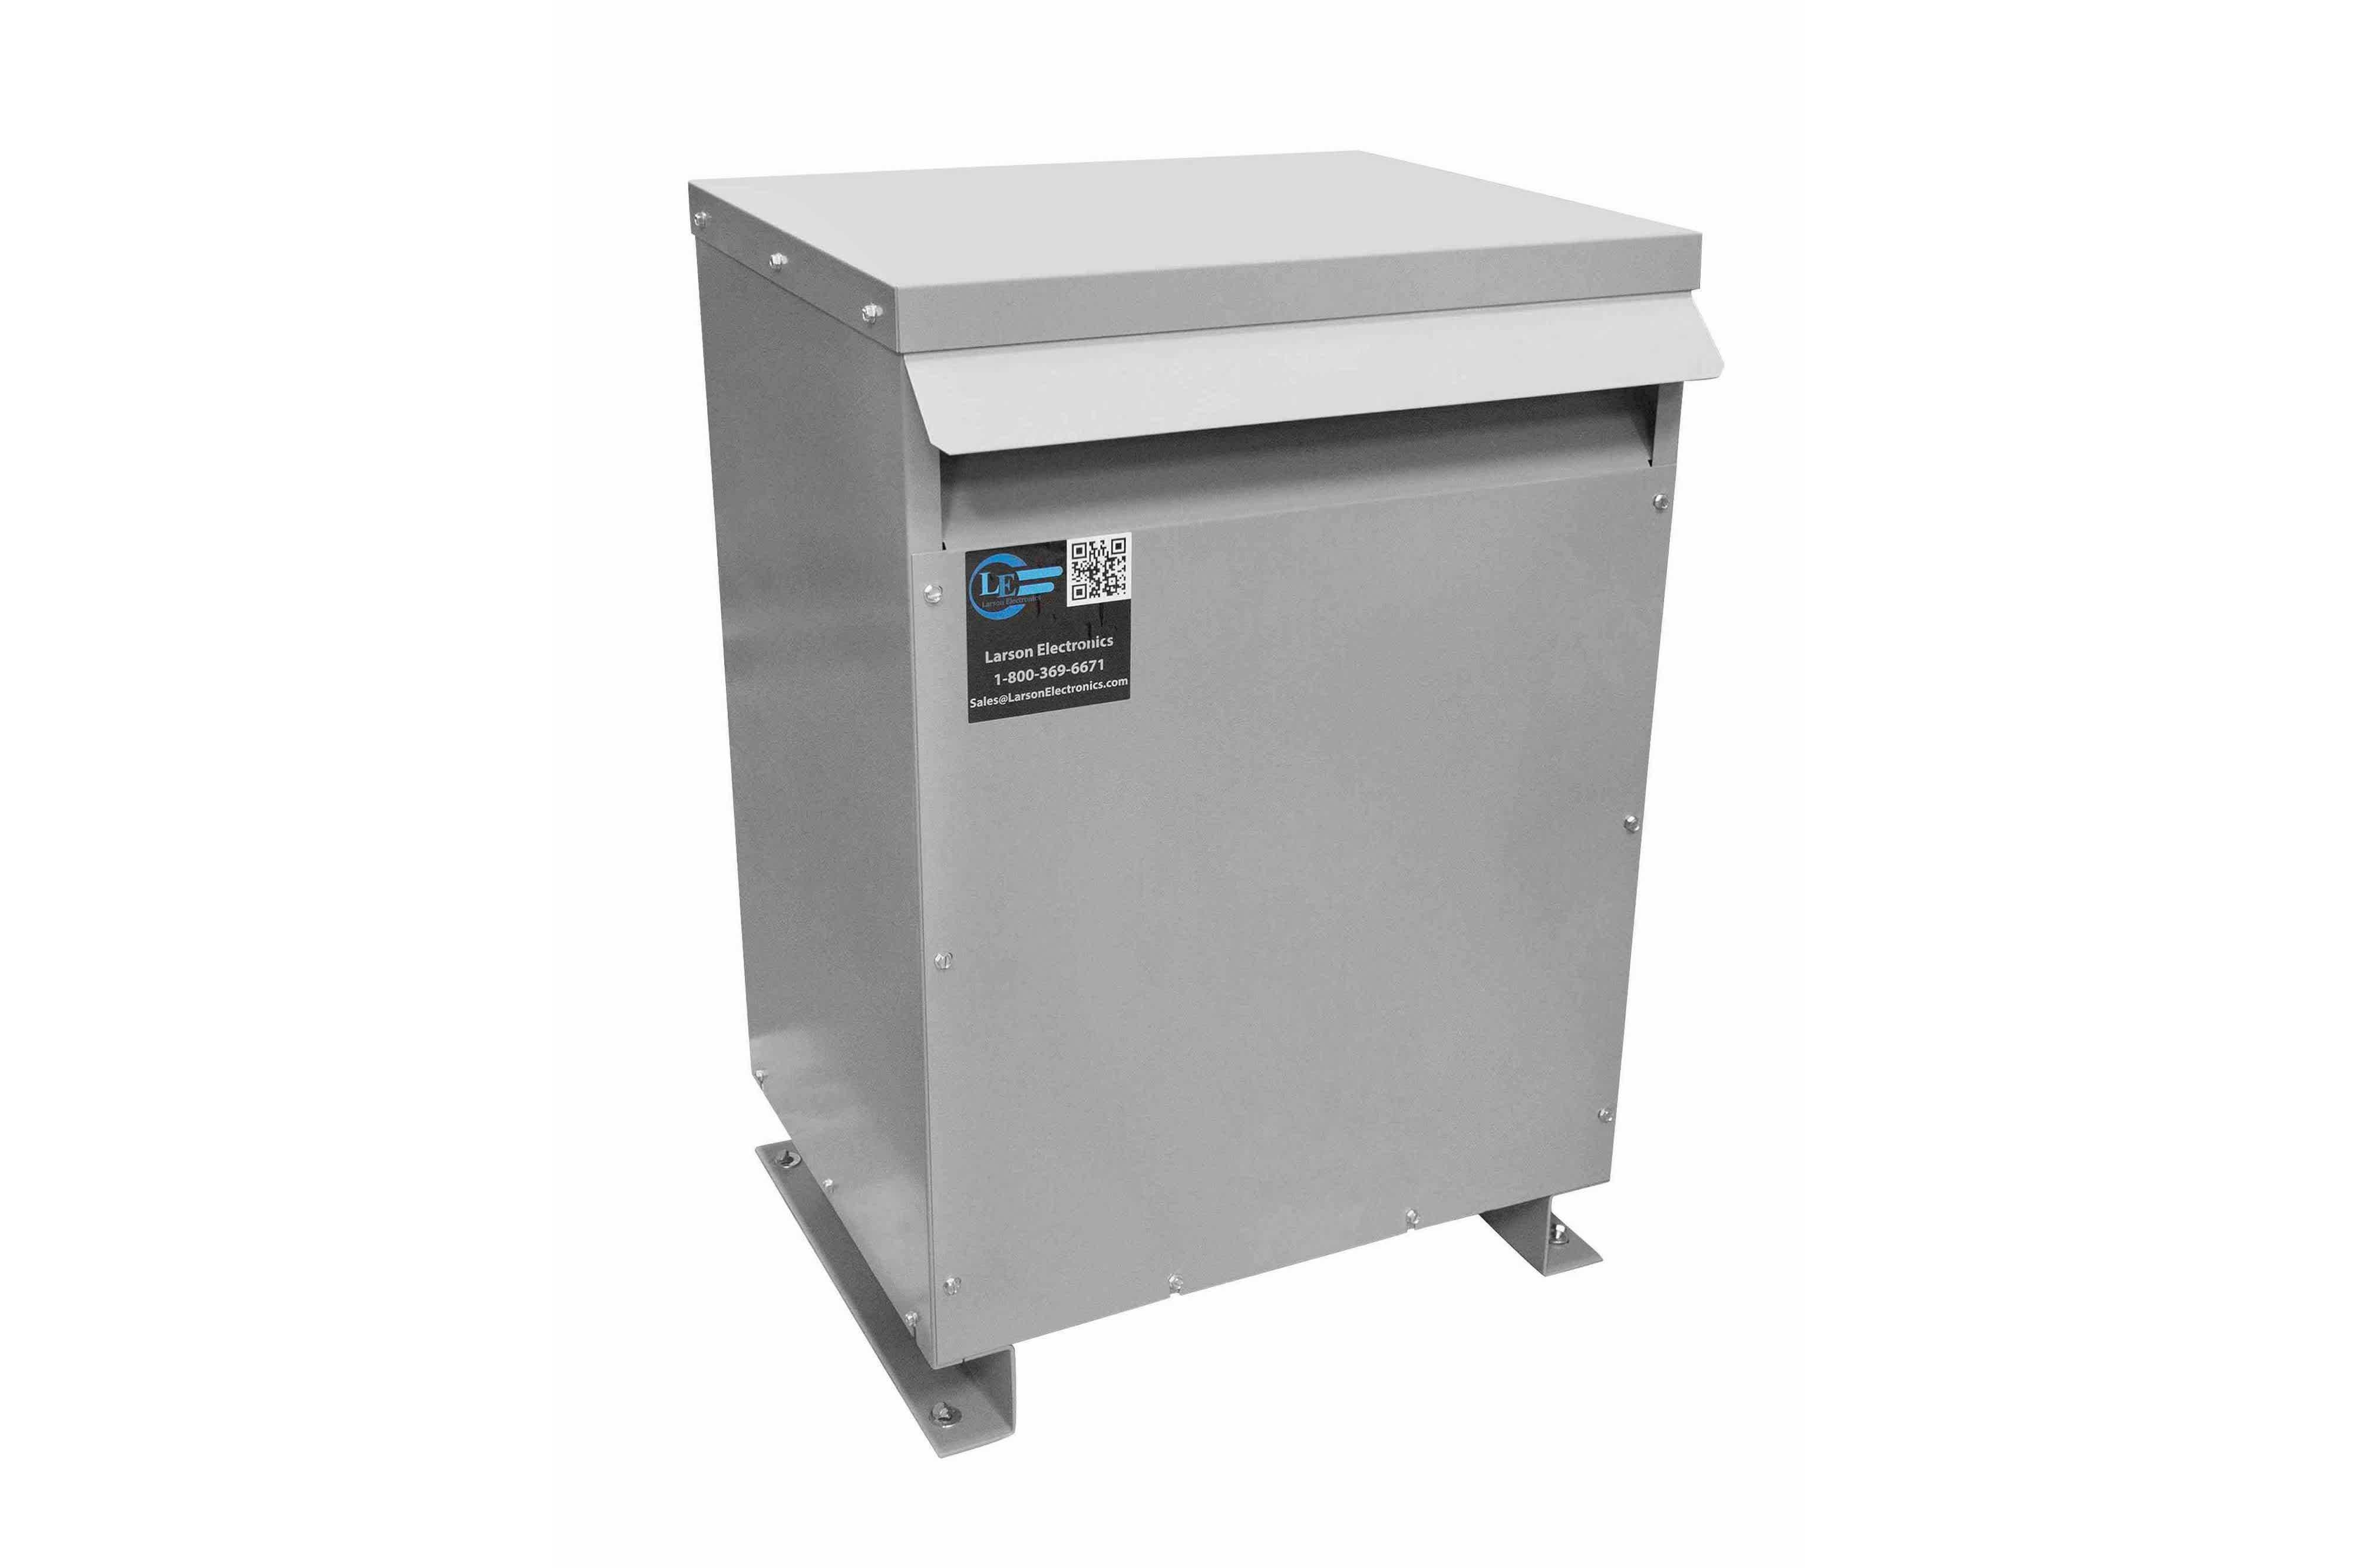 50 kVA 3PH DOE Transformer, 230V Delta Primary, 208Y/120 Wye-N Secondary, N3R, Ventilated, 60 Hz